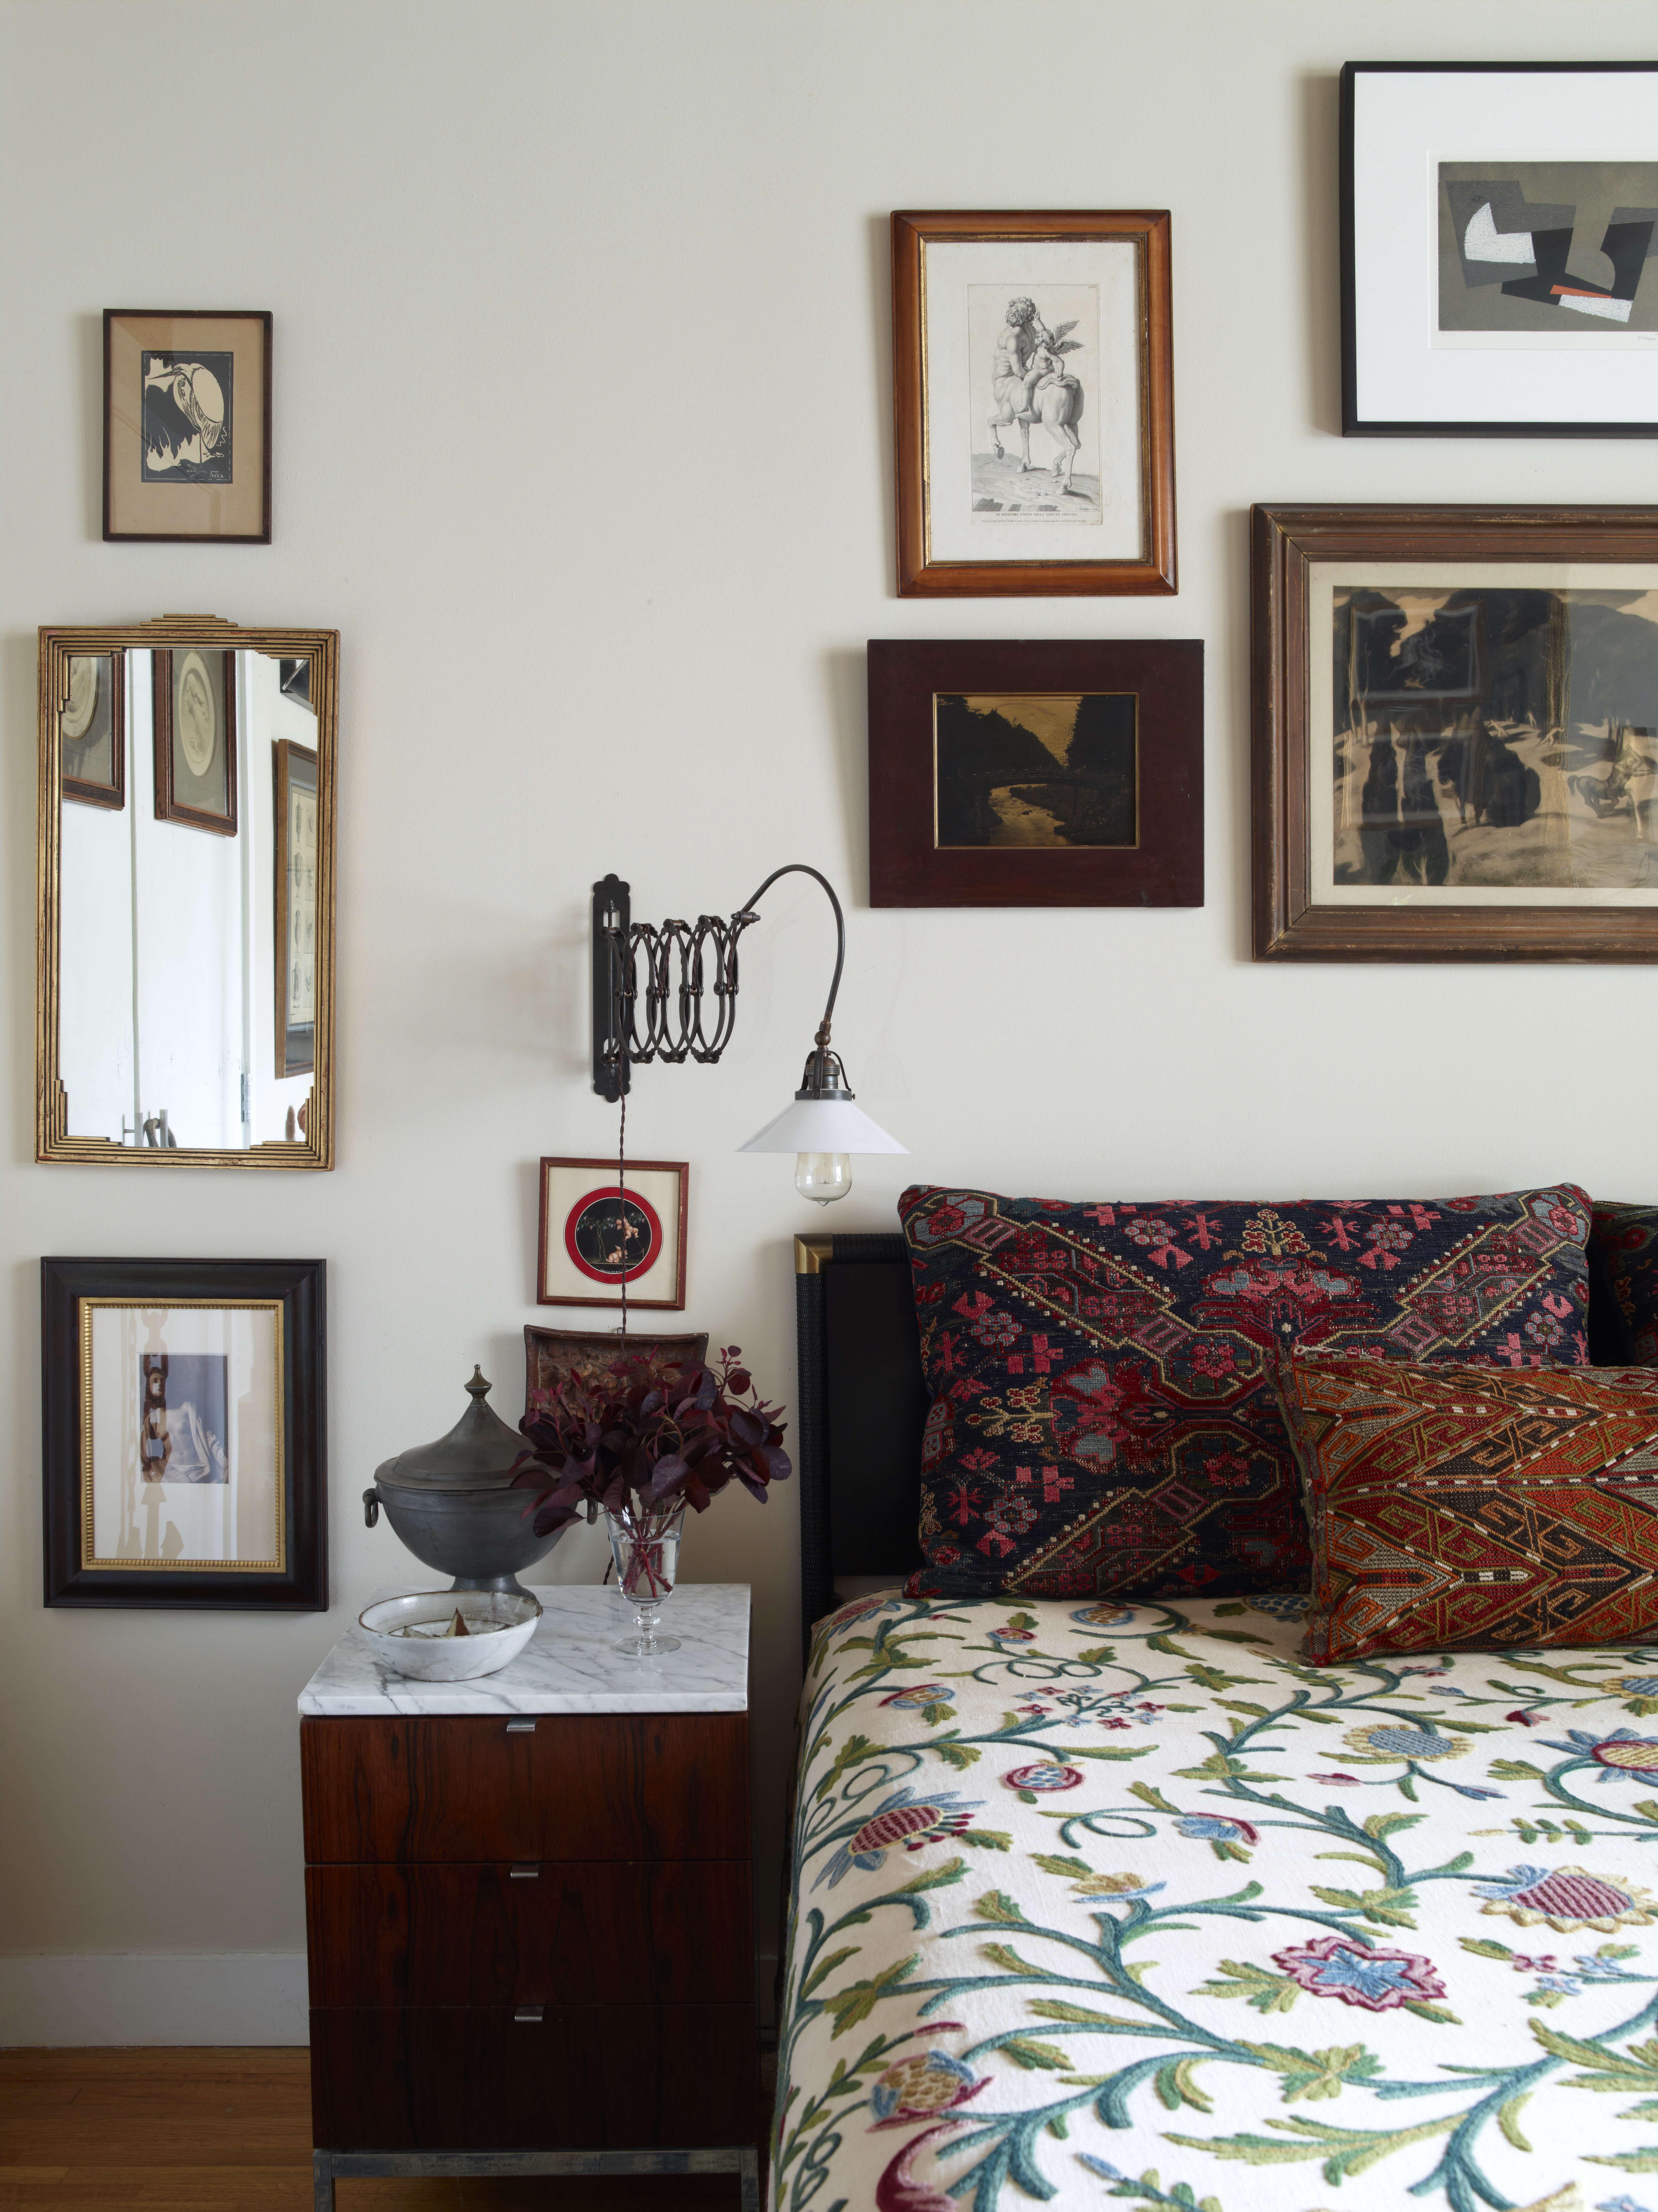 alexandra loew bedroom print bedspread mirror artwork walls 17